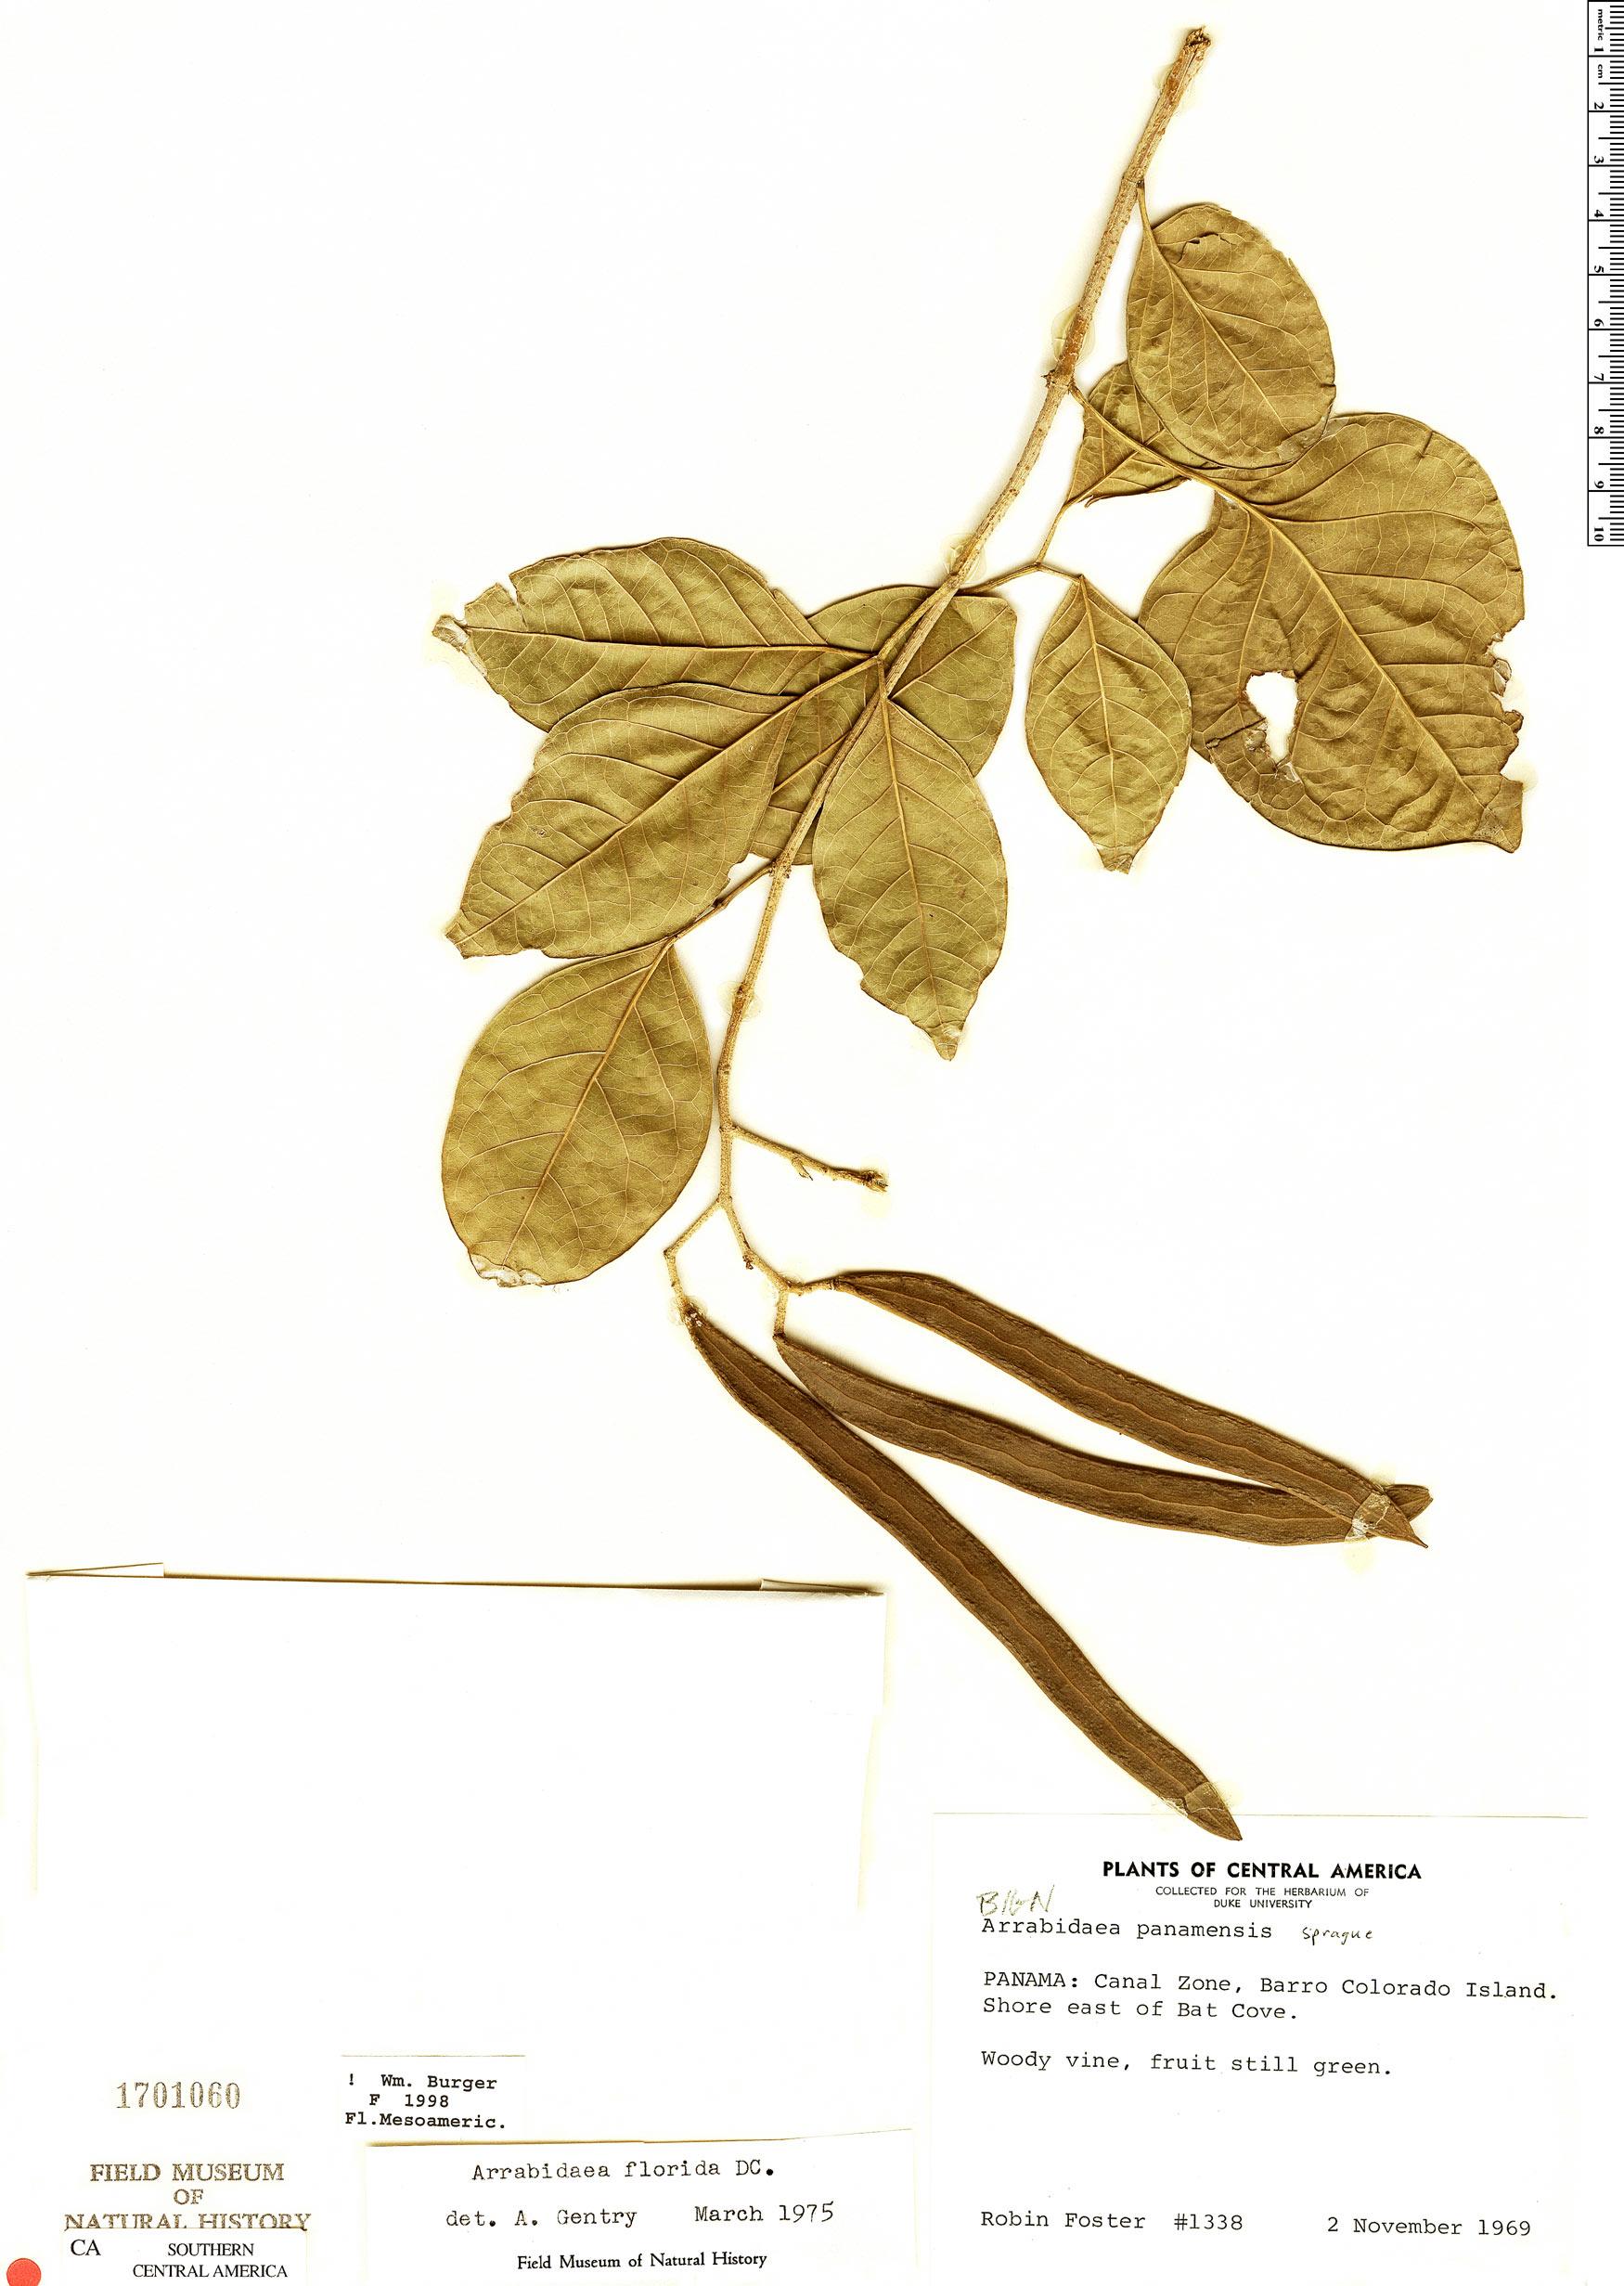 Espécimen: Fridericia florida